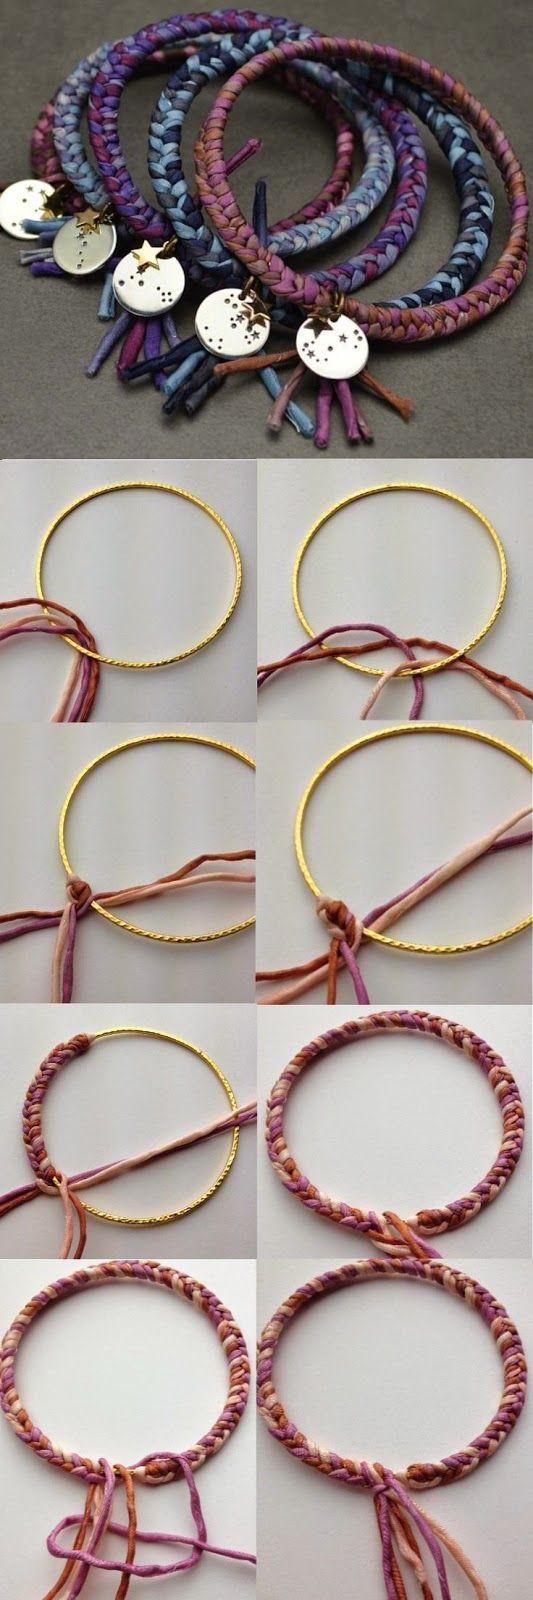 Boho bracelets tutorial | Fashion And Style